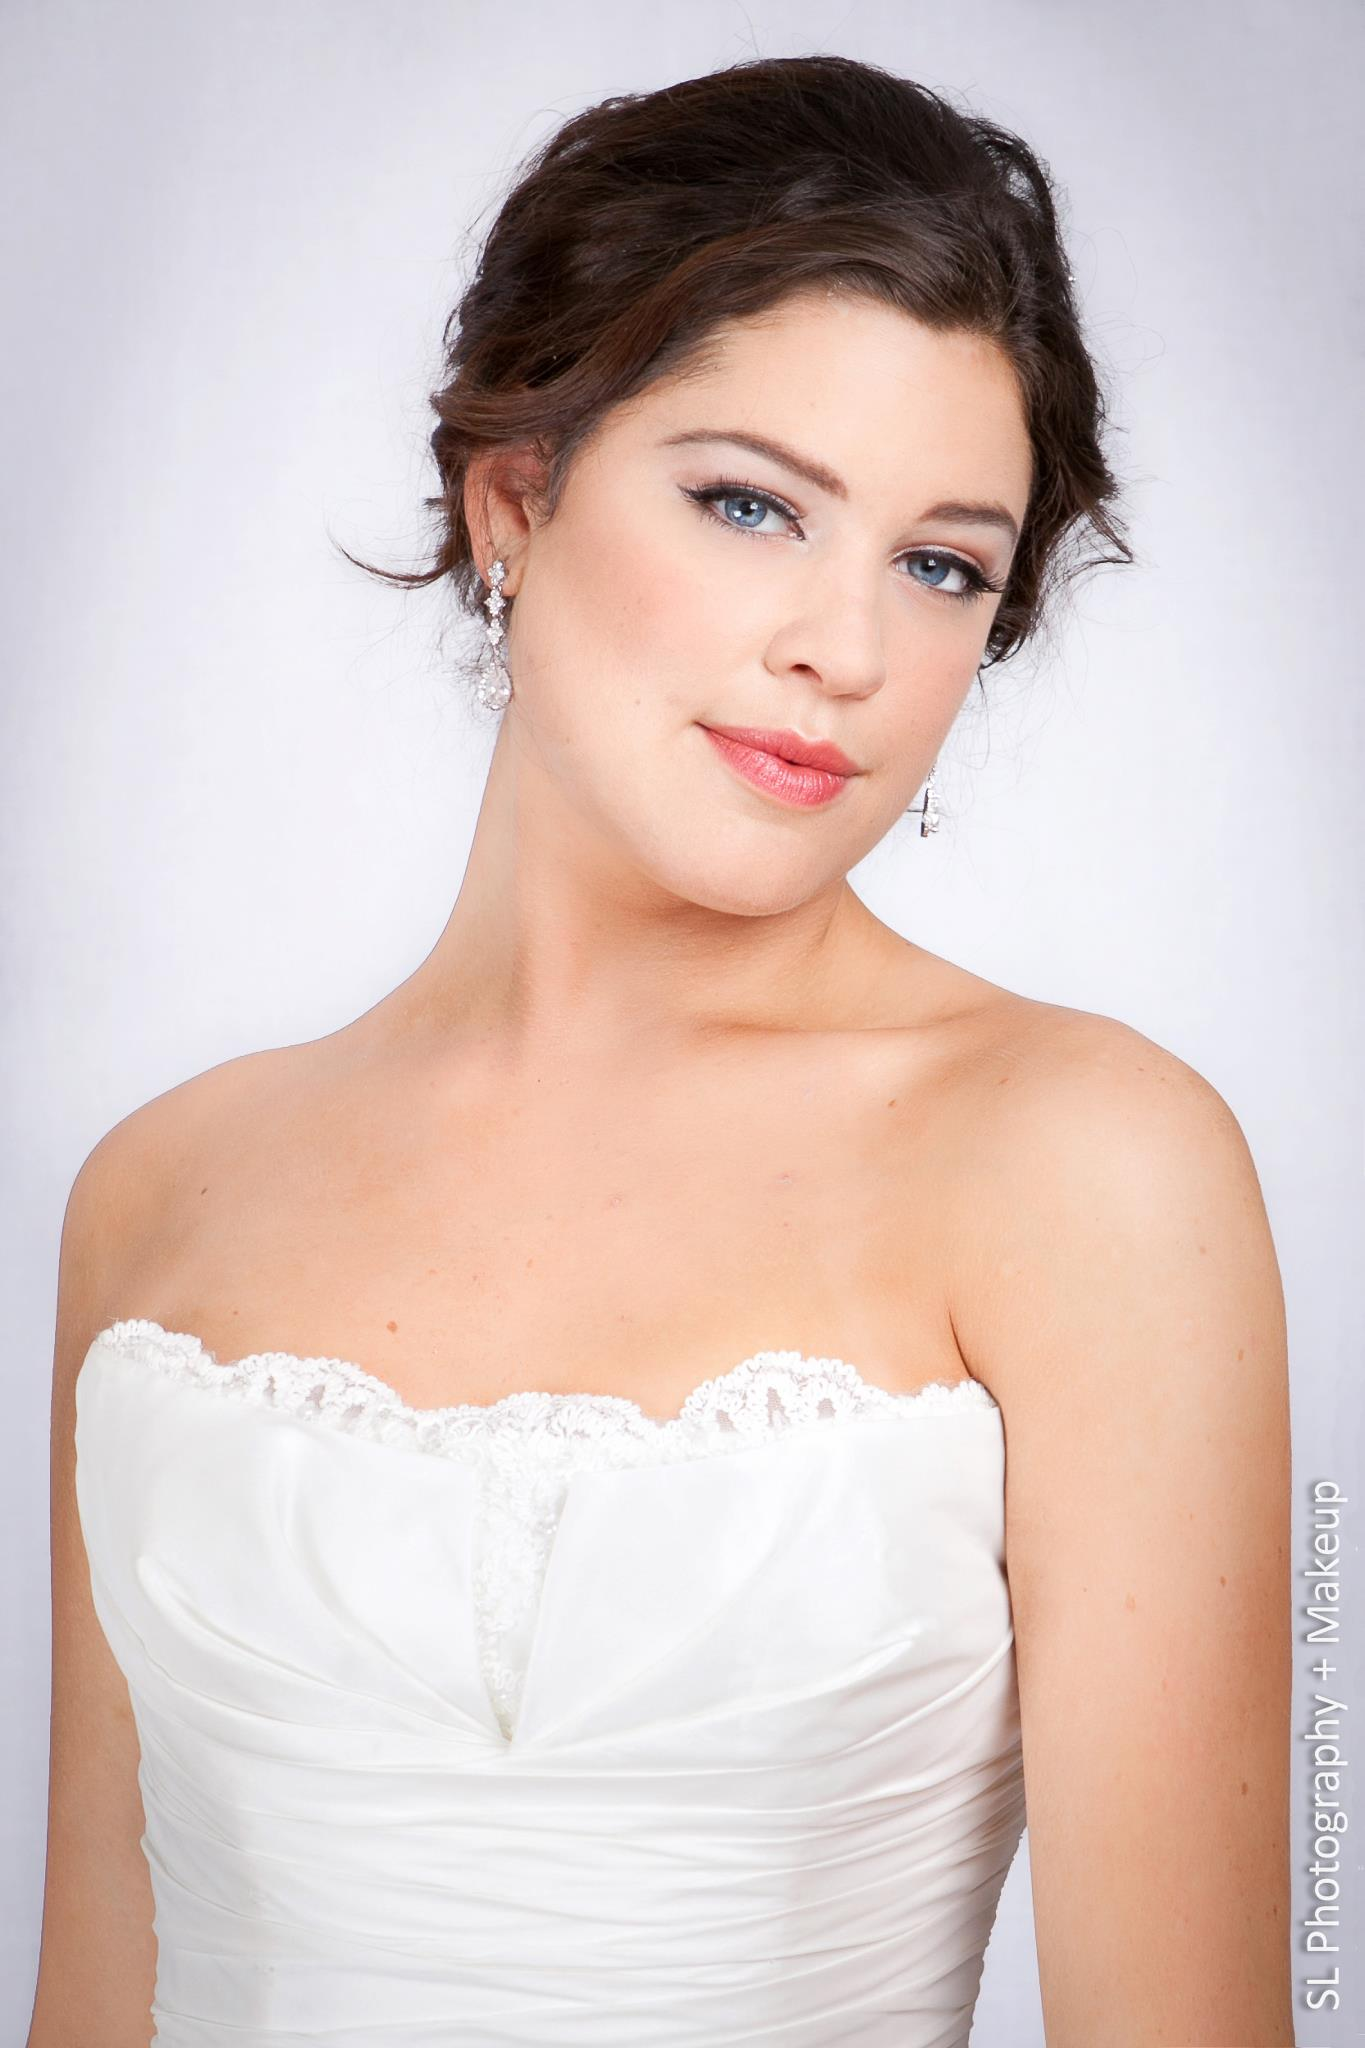 Tiffany Claus,Alta Allen Sex clip Yves Amyot,Brooke Adams (actress)